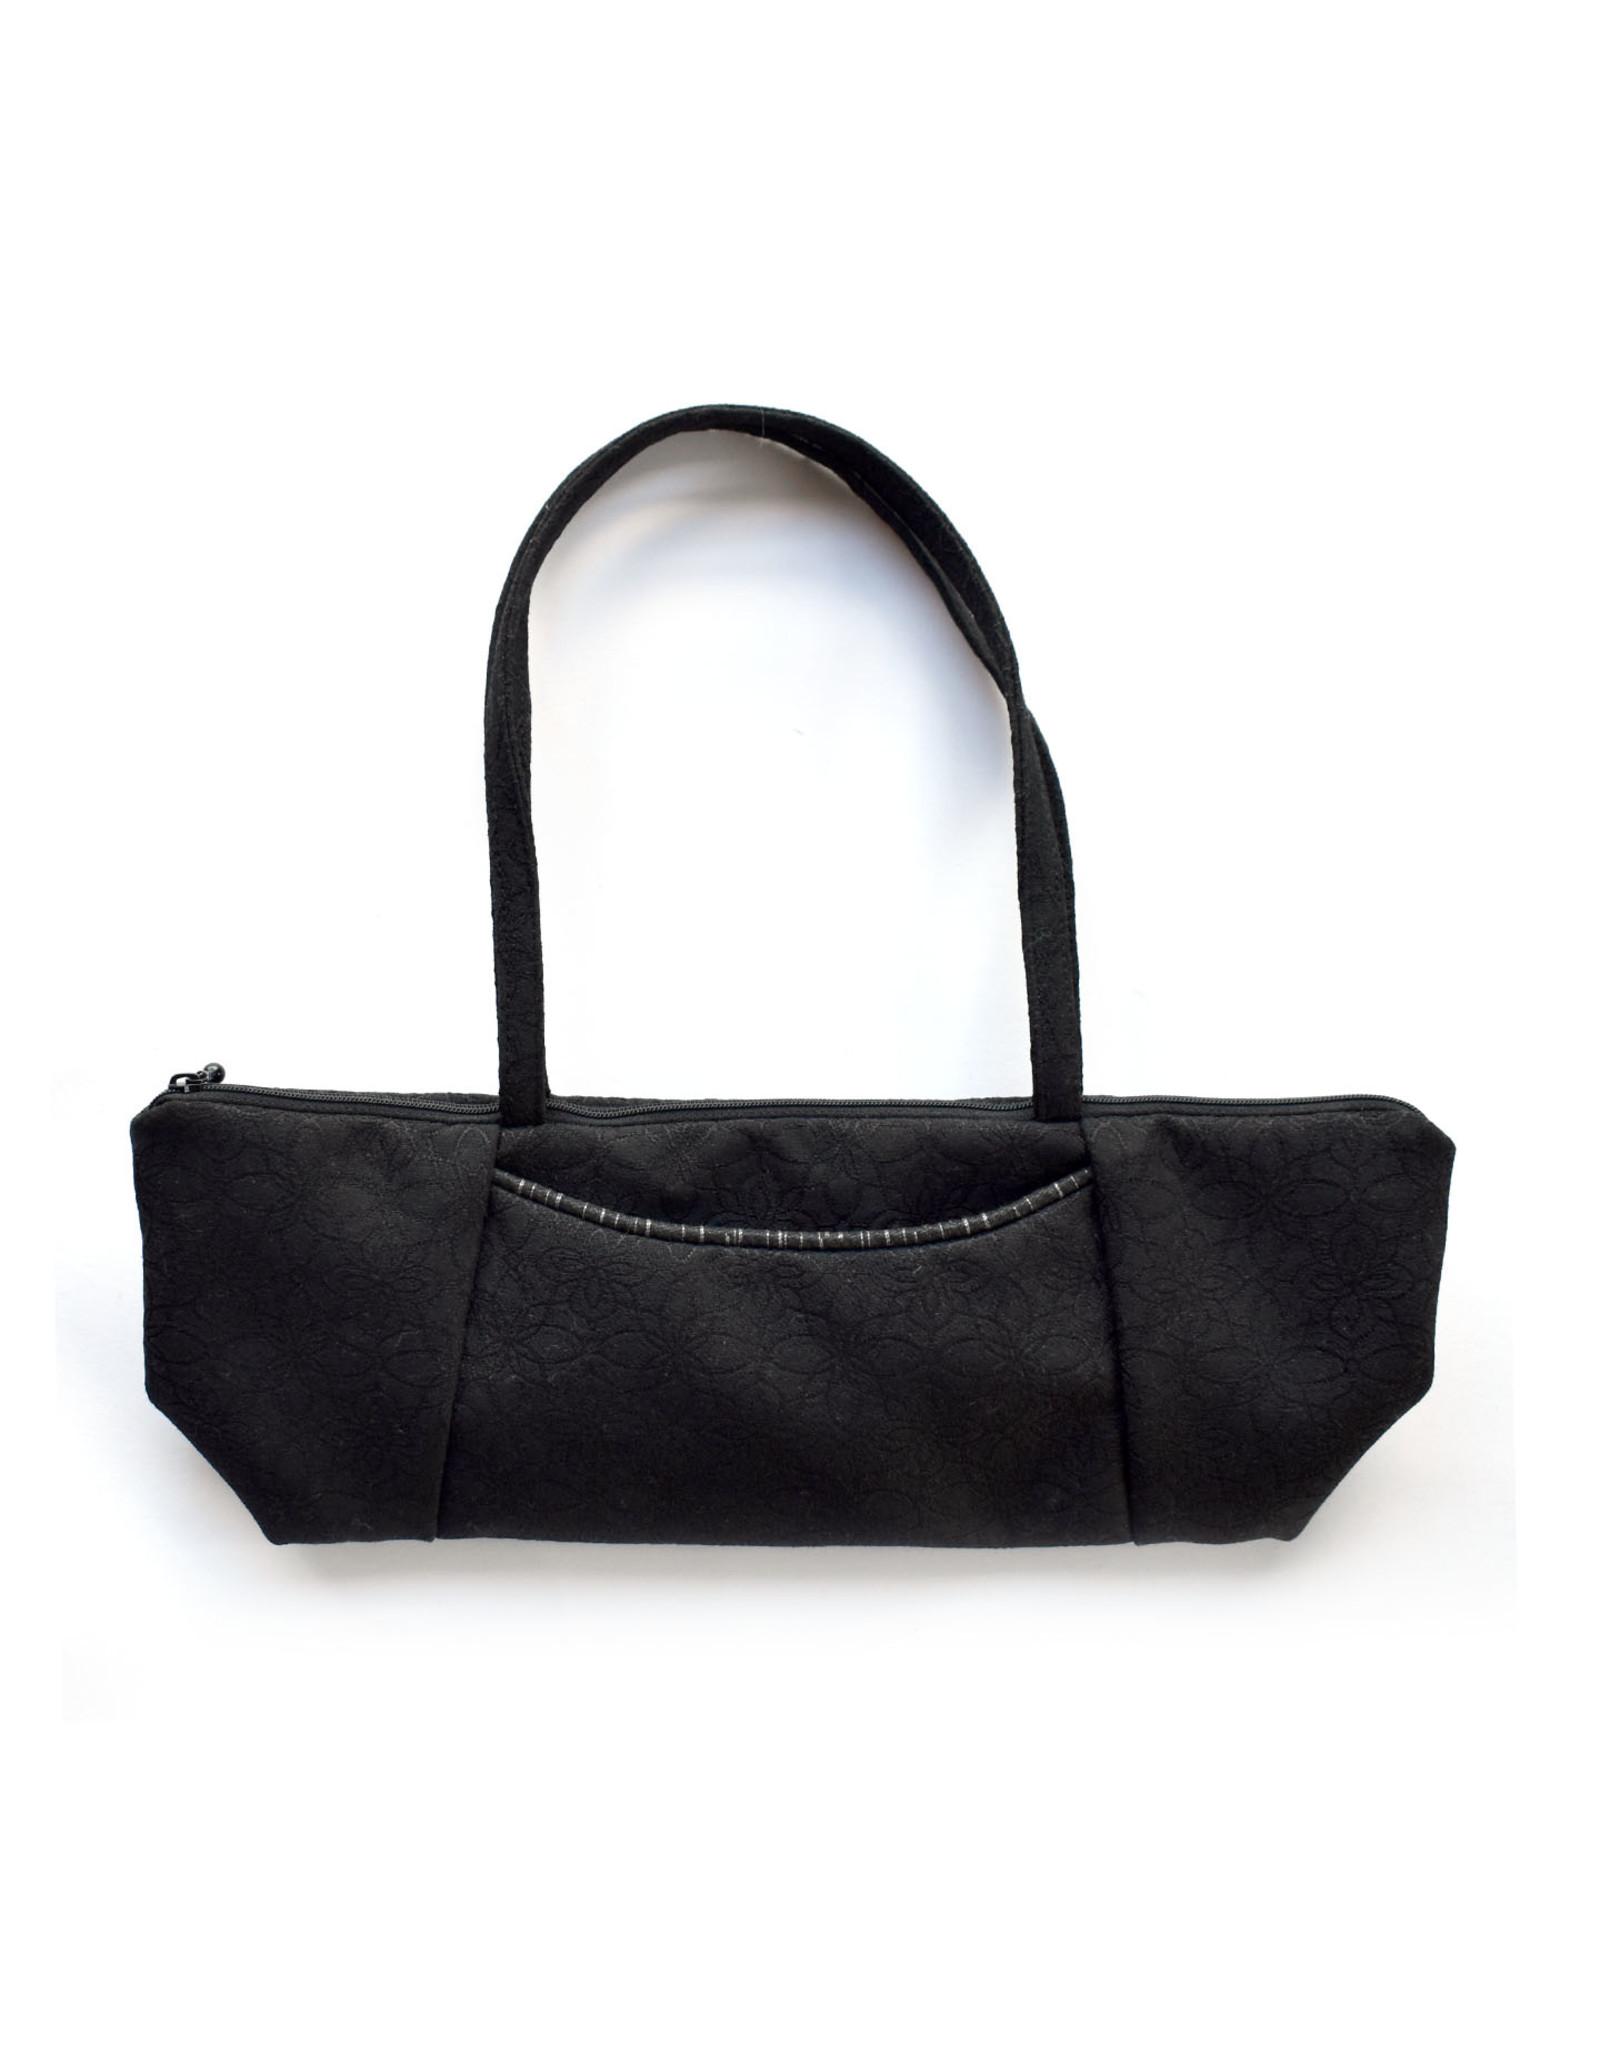 Millie-Lu Bag